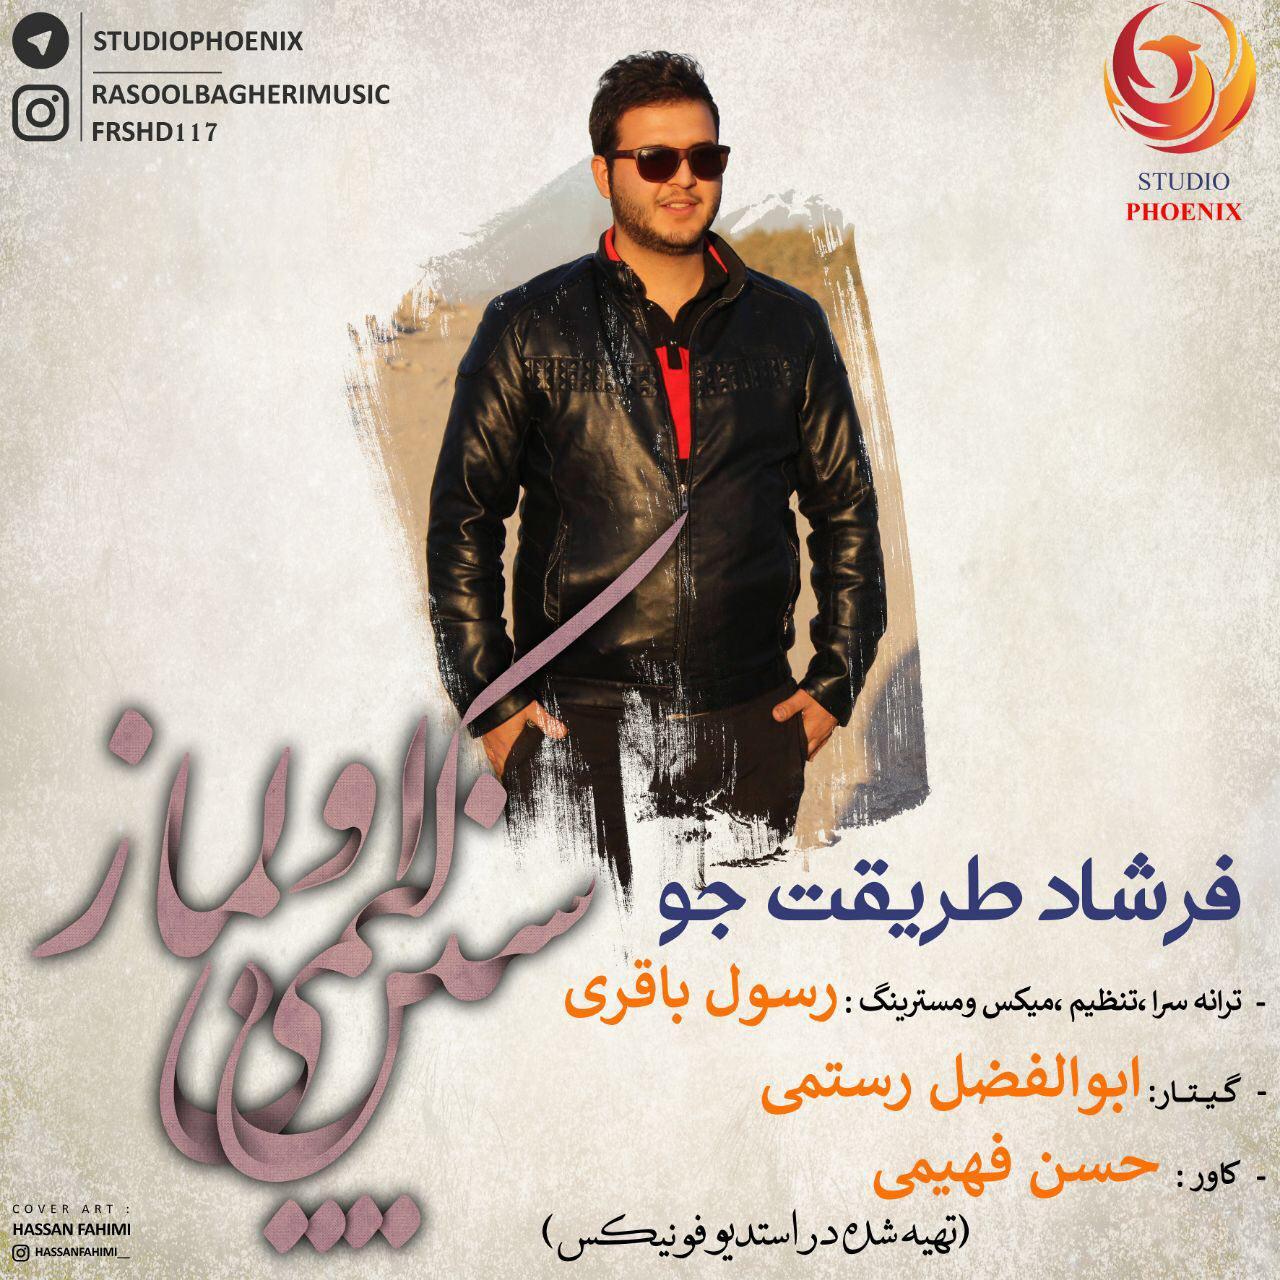 http://s3.picofile.com/file/8369706442/09Farshad_Tarighatjoo_Sanin_Kimi_Olmaz.jpg